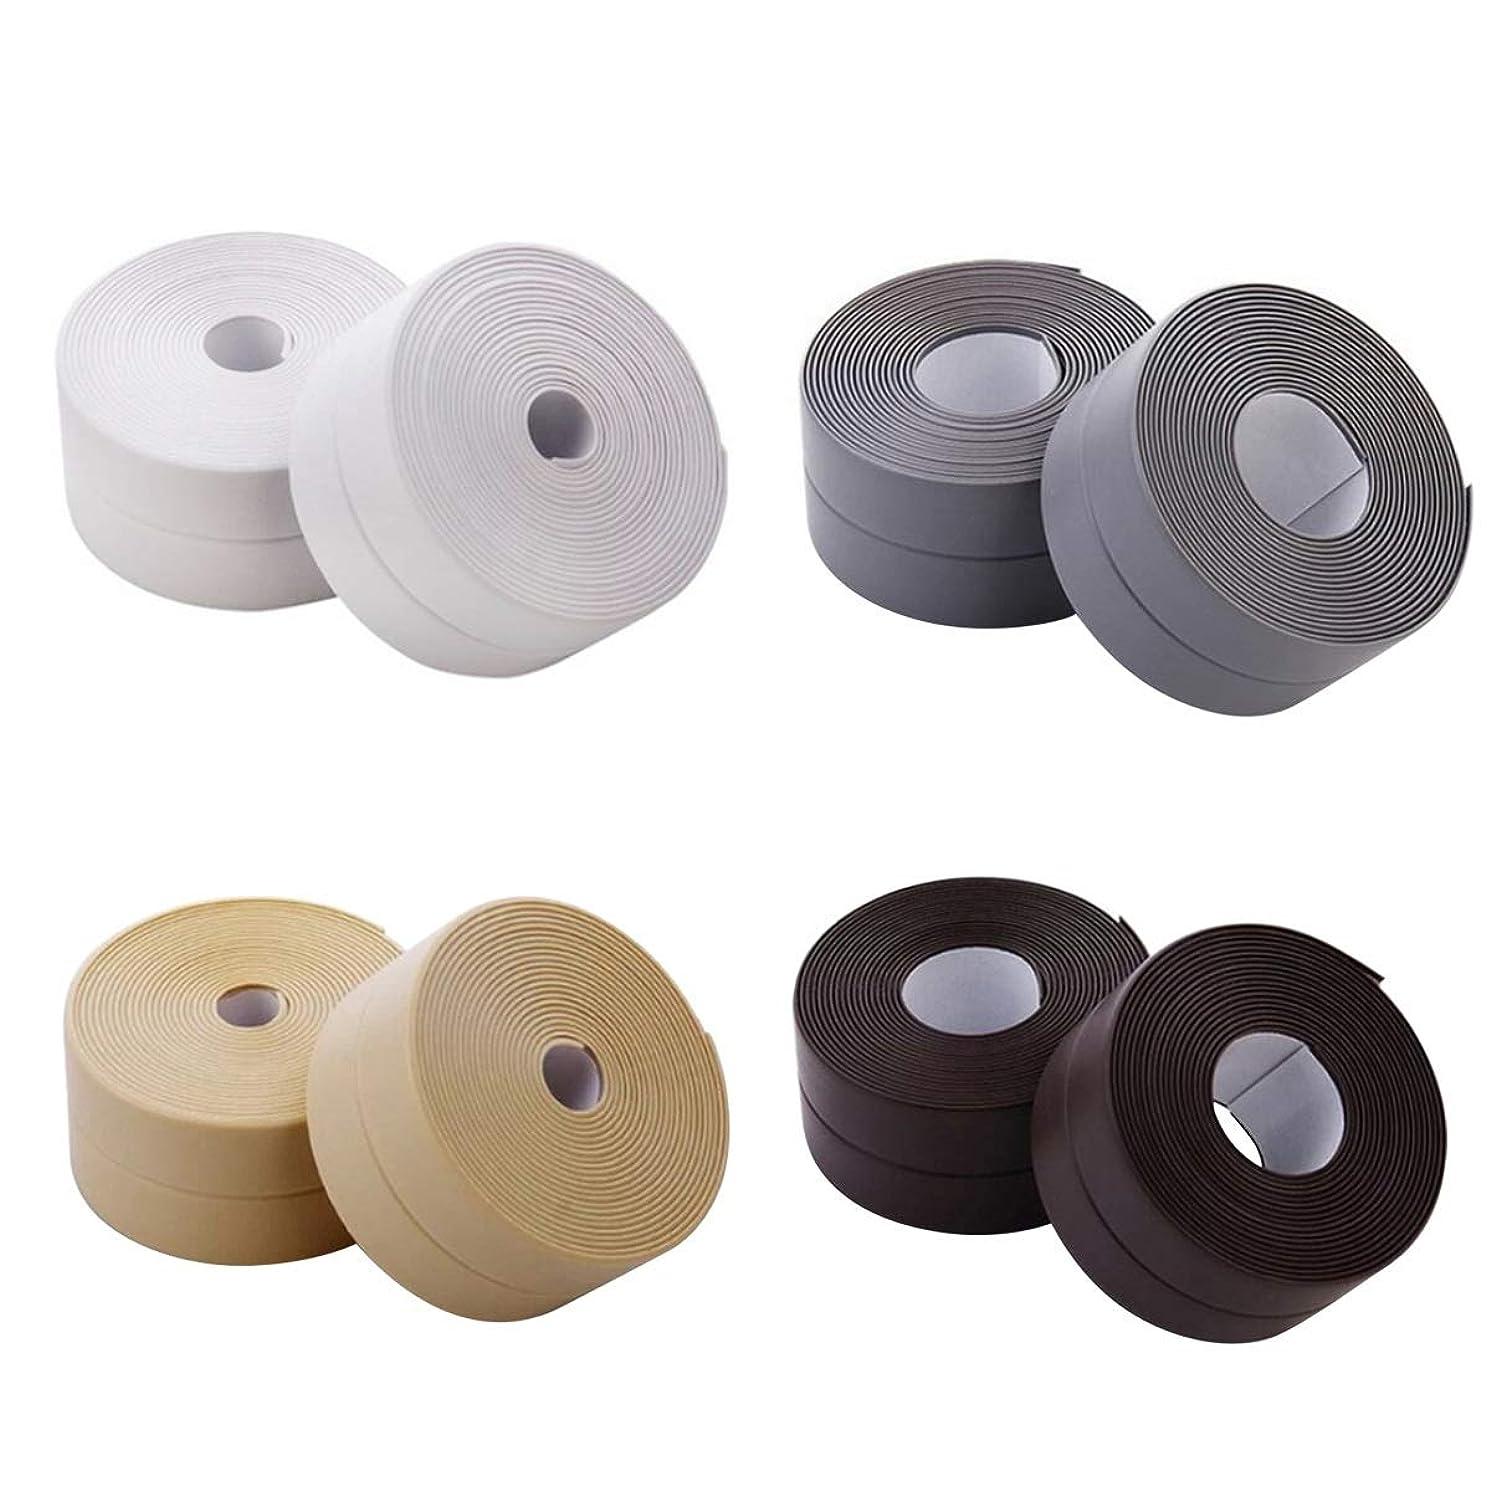 Sealing Strip Flexible Self Adhesive Caulking Tape Waterproof for Kitchen Bathroom Tub Shower Floor Wall Edge Protector (Color : Grey)